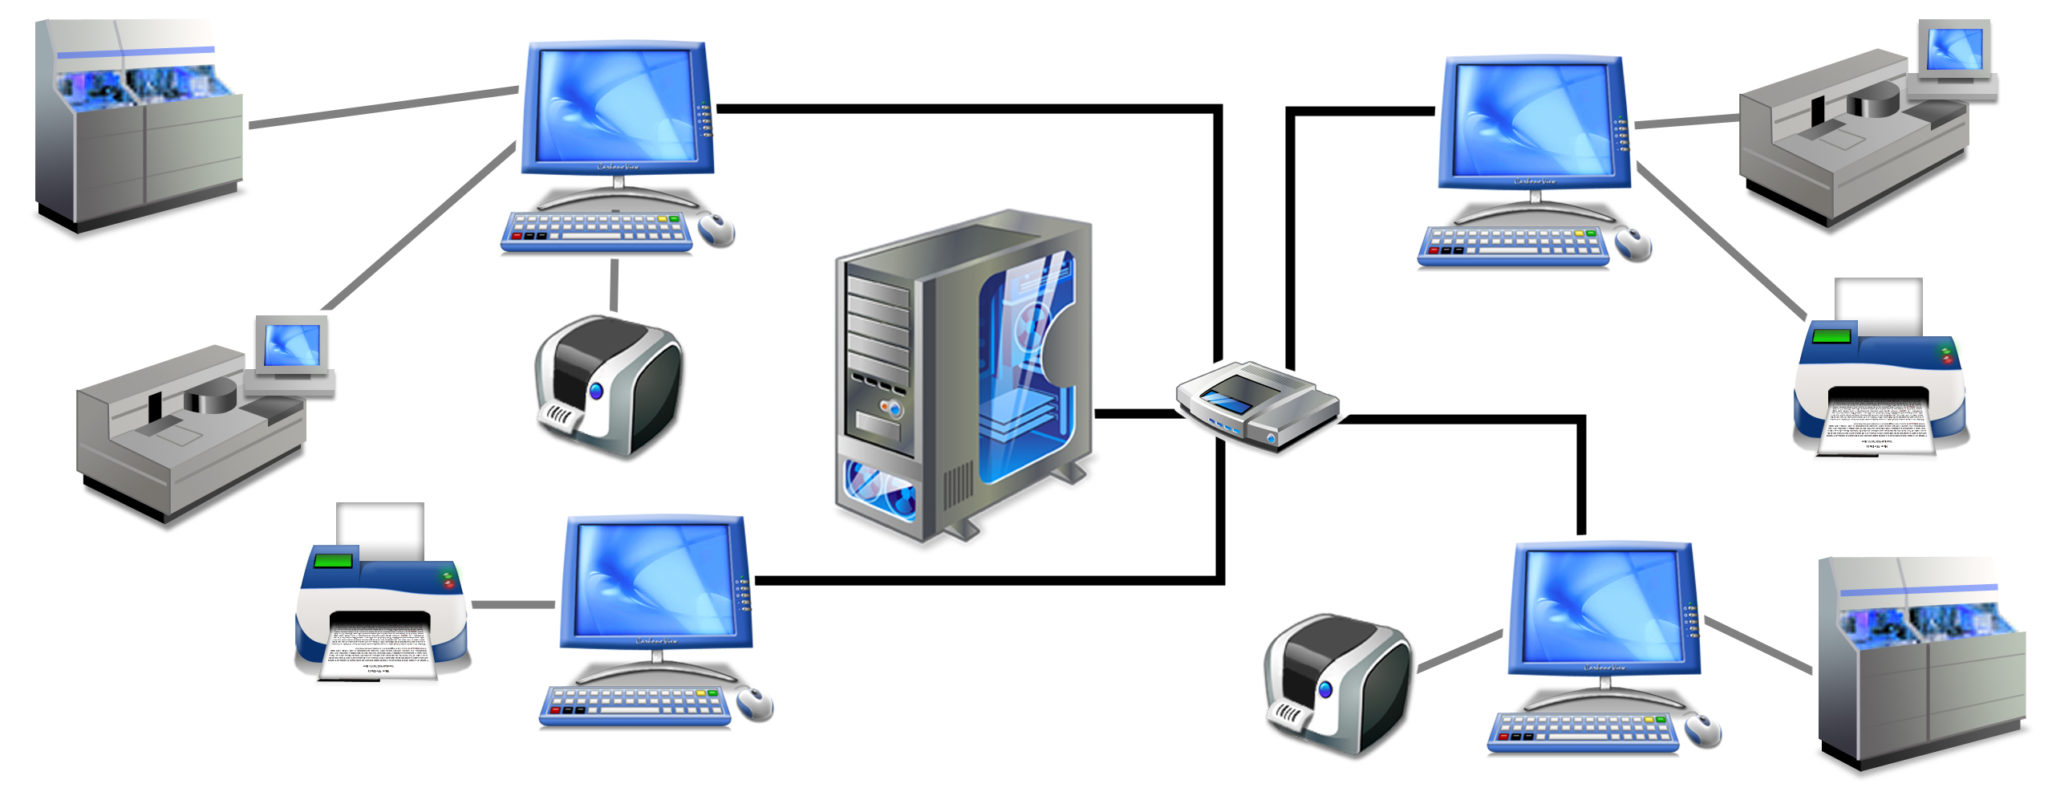 Refurbished Cisco Switch - A Vital Network Device